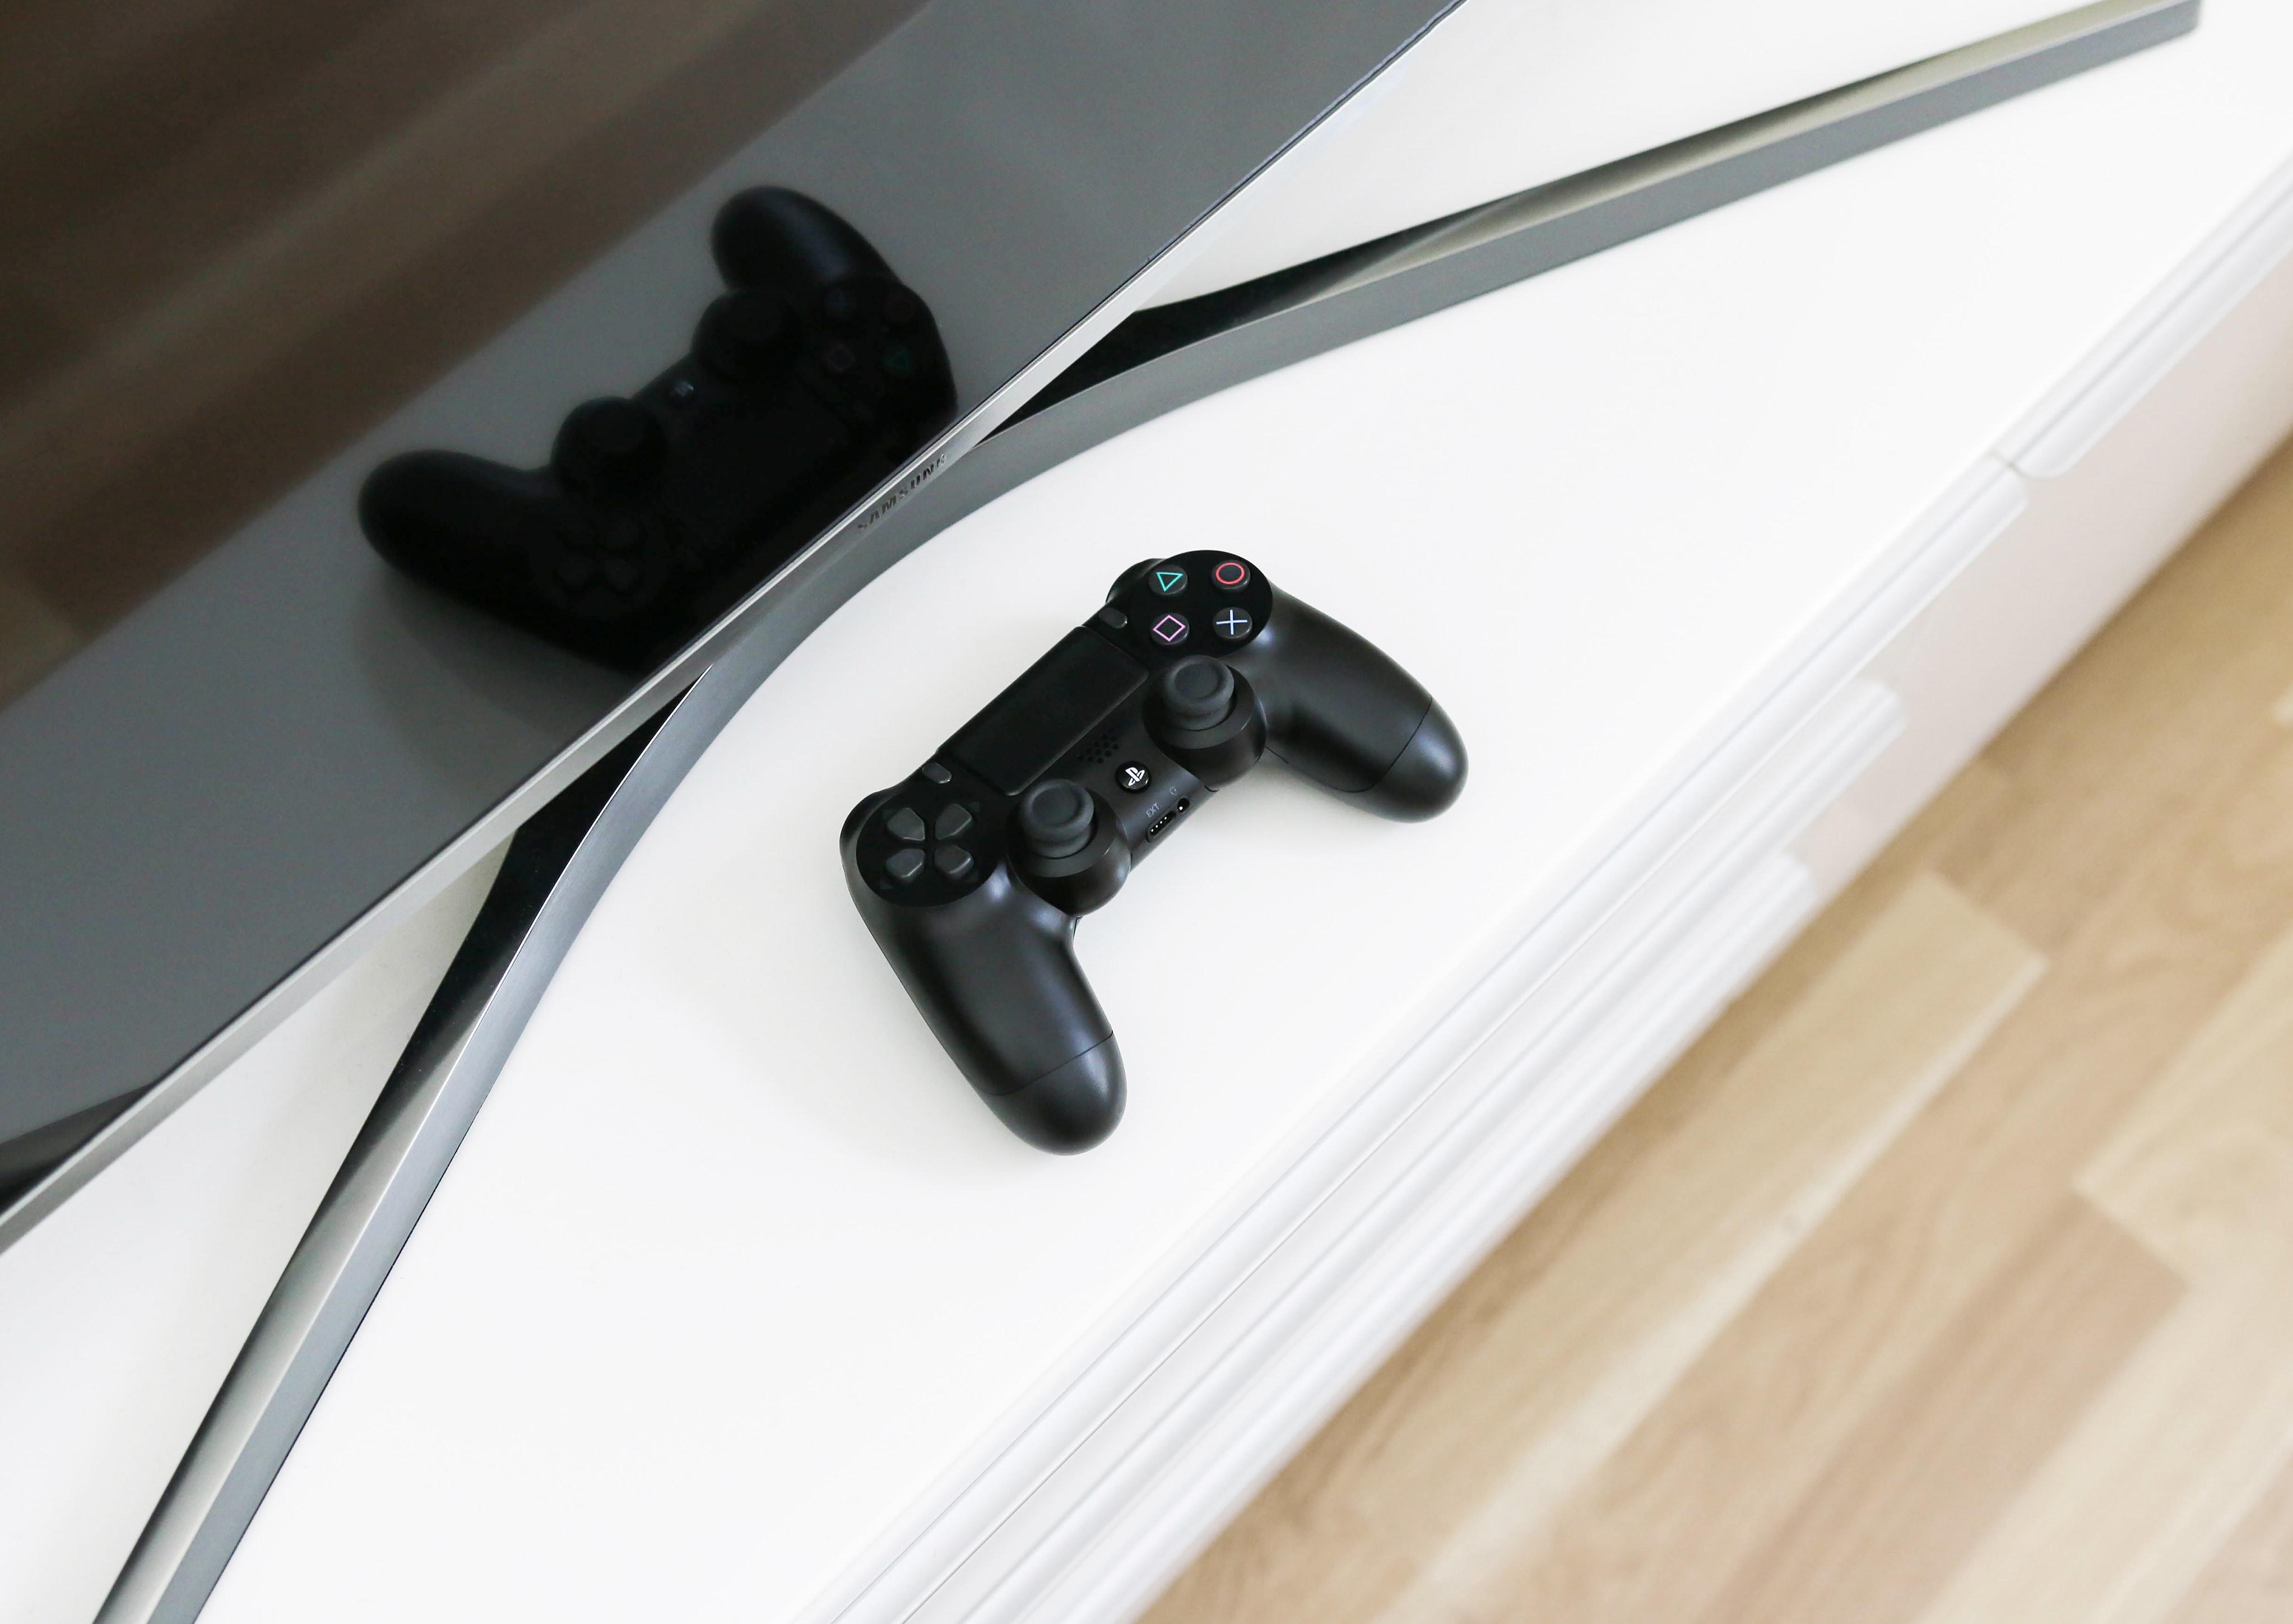 A PlayStation controller near a TV.